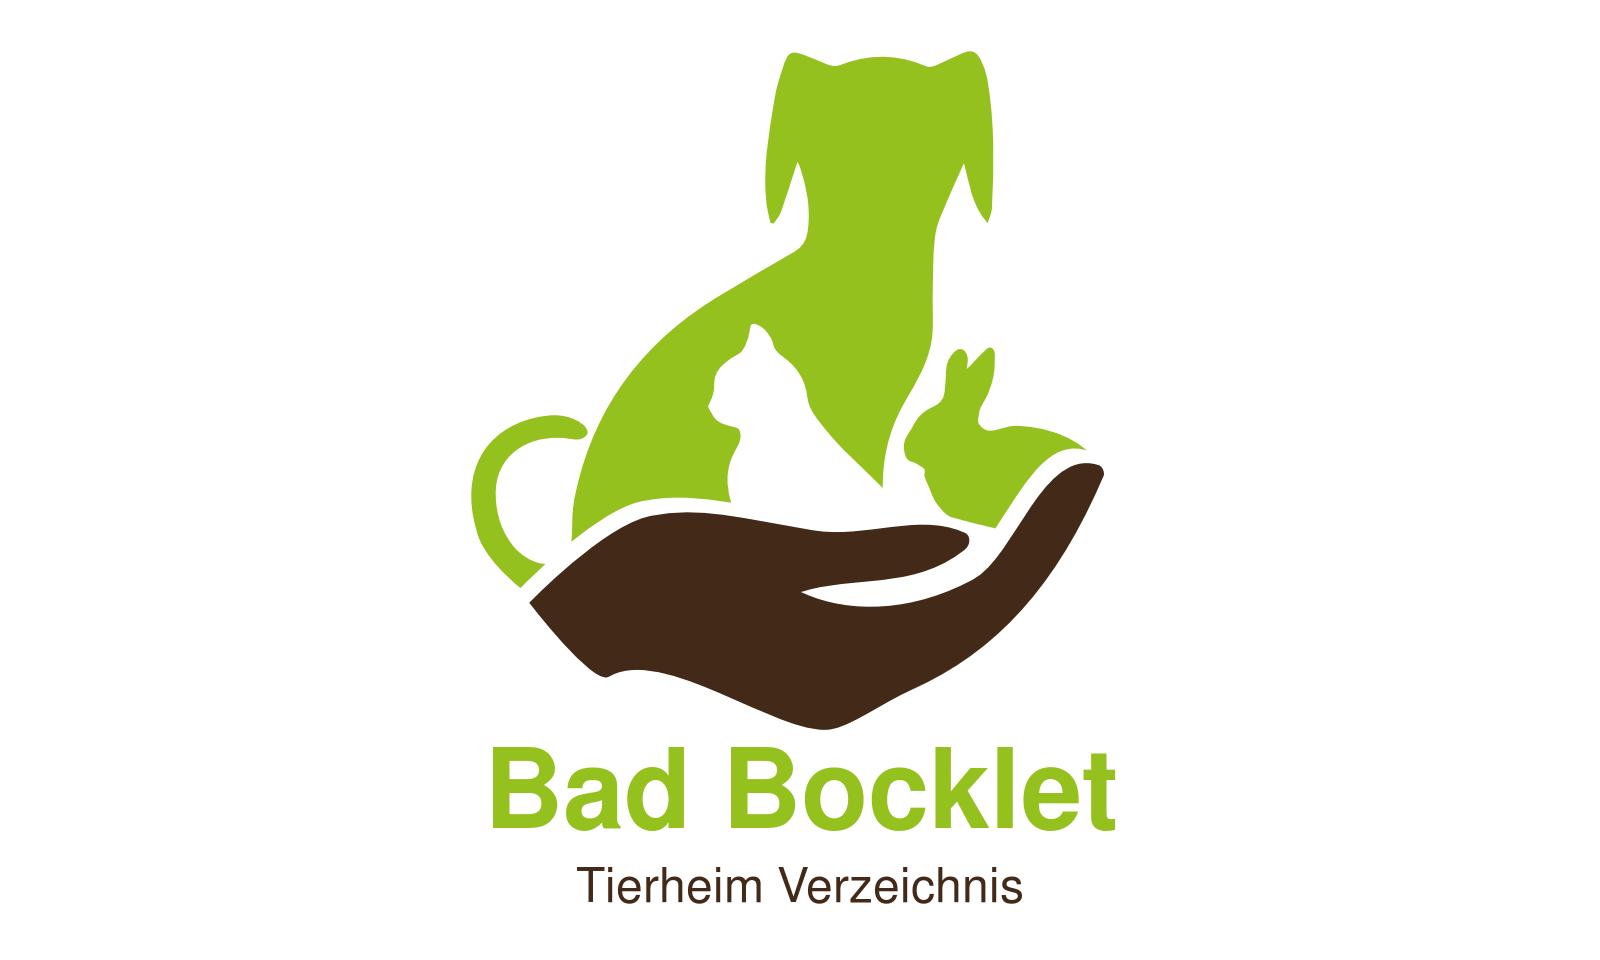 Tierheim Bad Bocklet